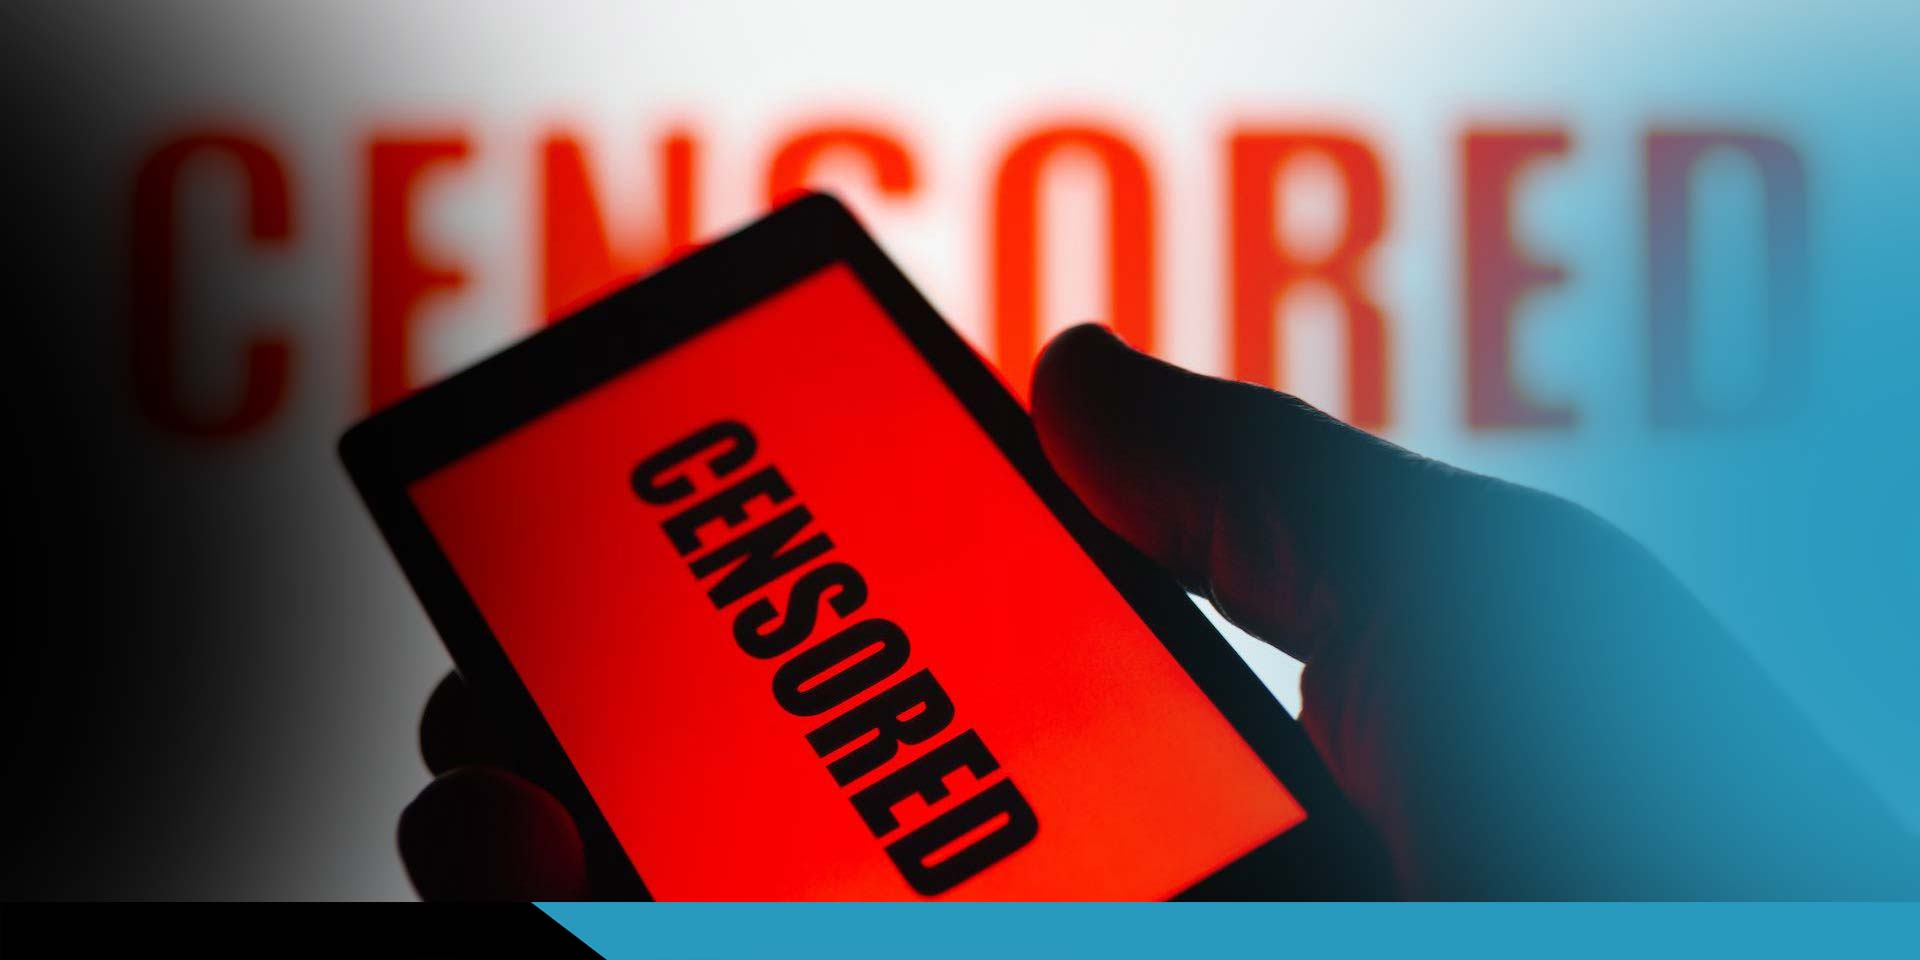 bypass filtering censorship